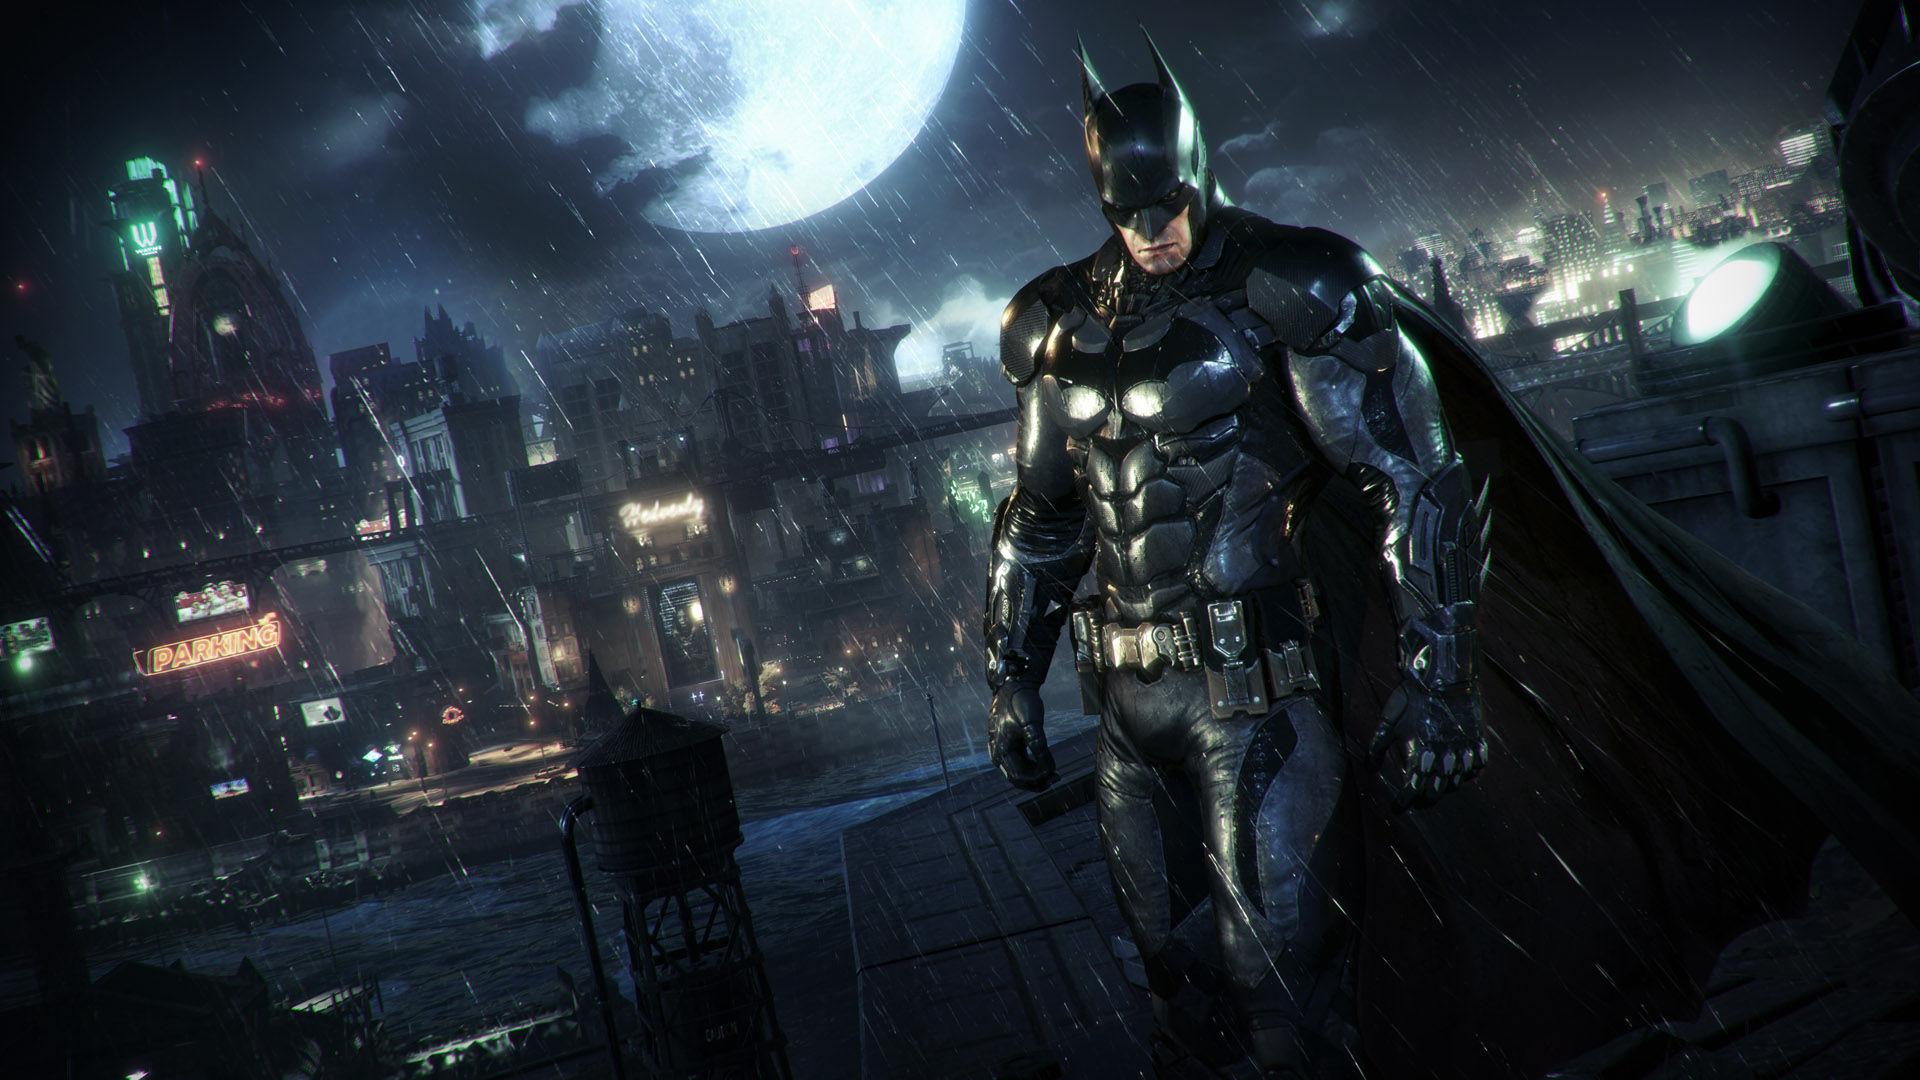 E3 2014: Batman: Arkham Knight Preview: The Batmobile Rises